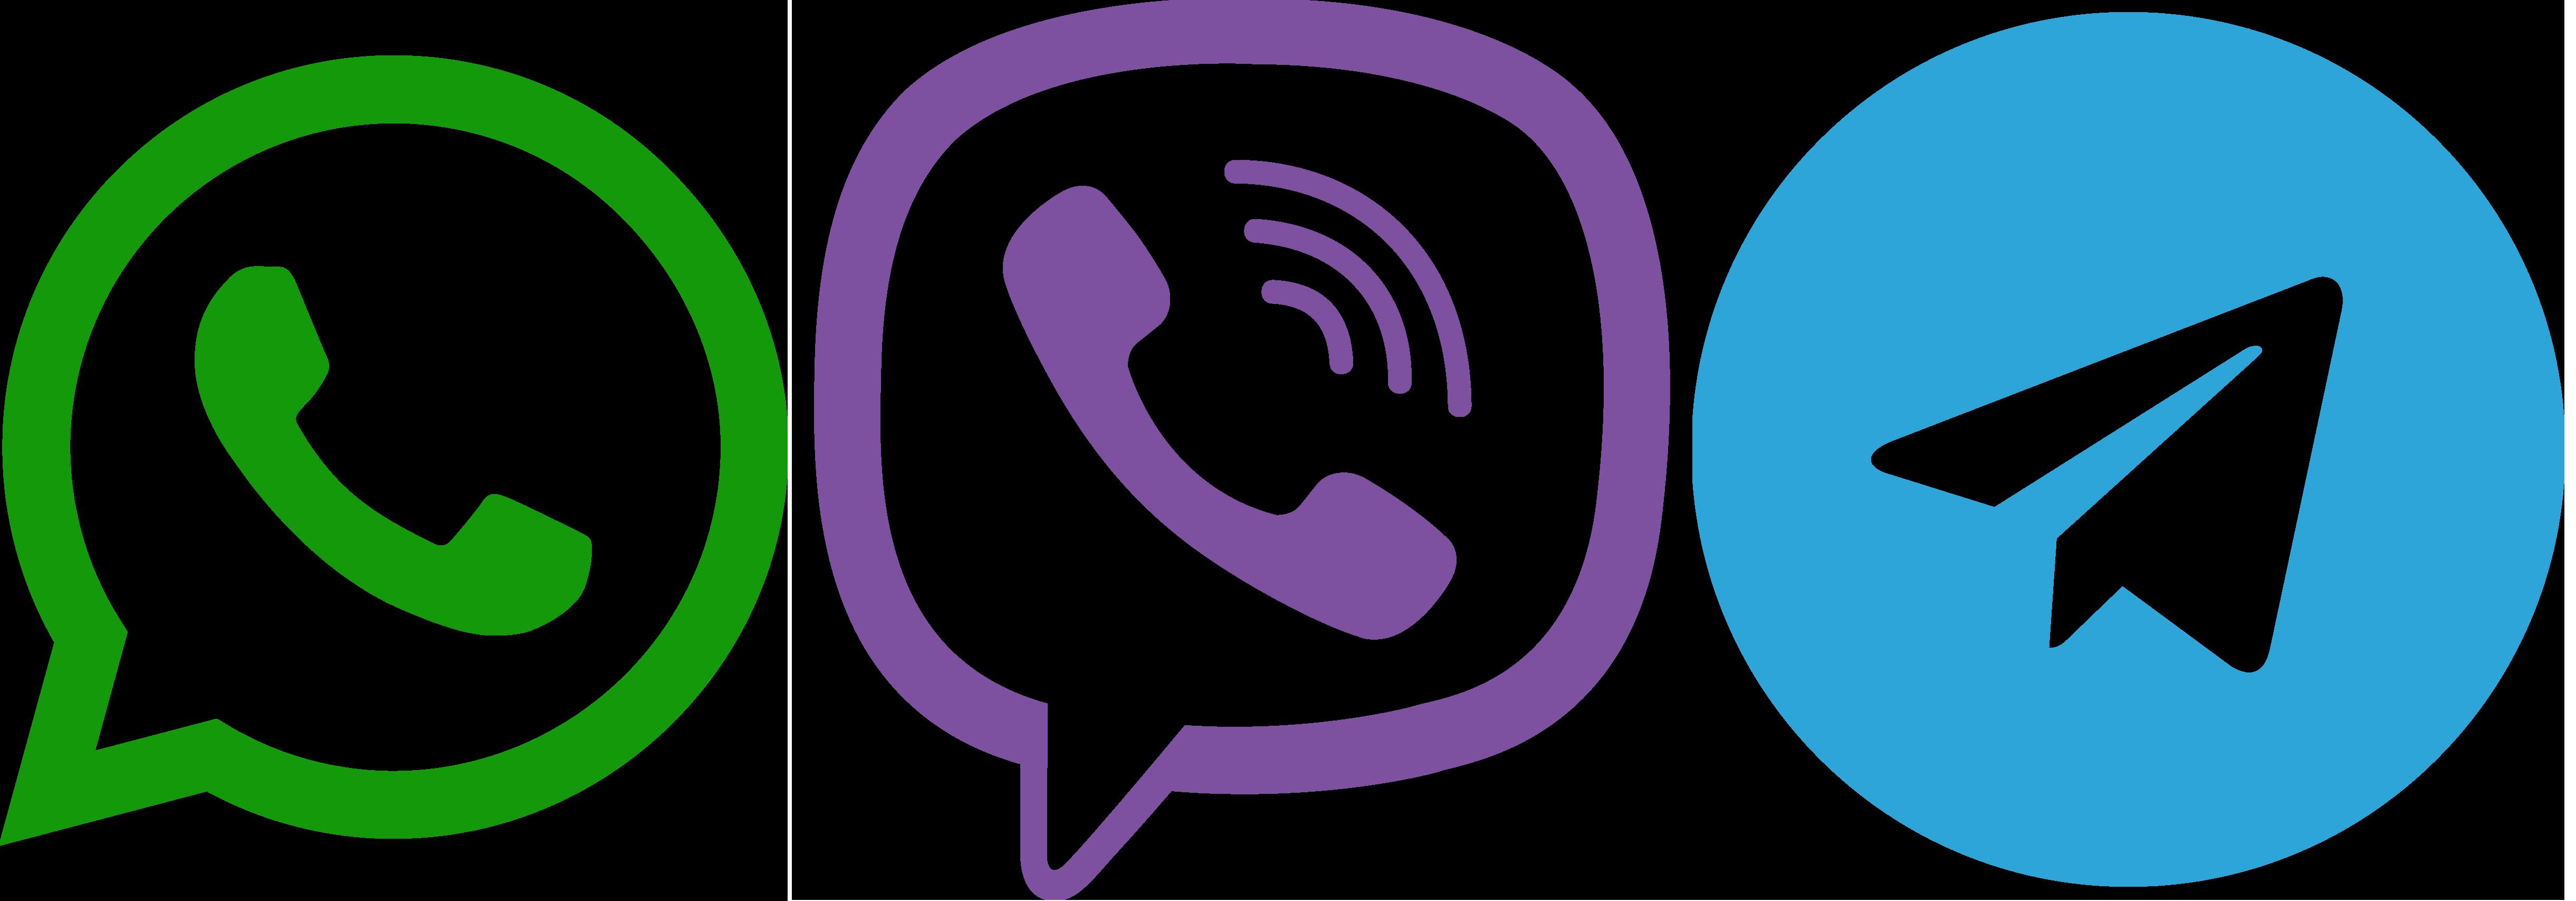 Download Instant Mobile Telegram App Viber Messaging Whatsapp HQ ...